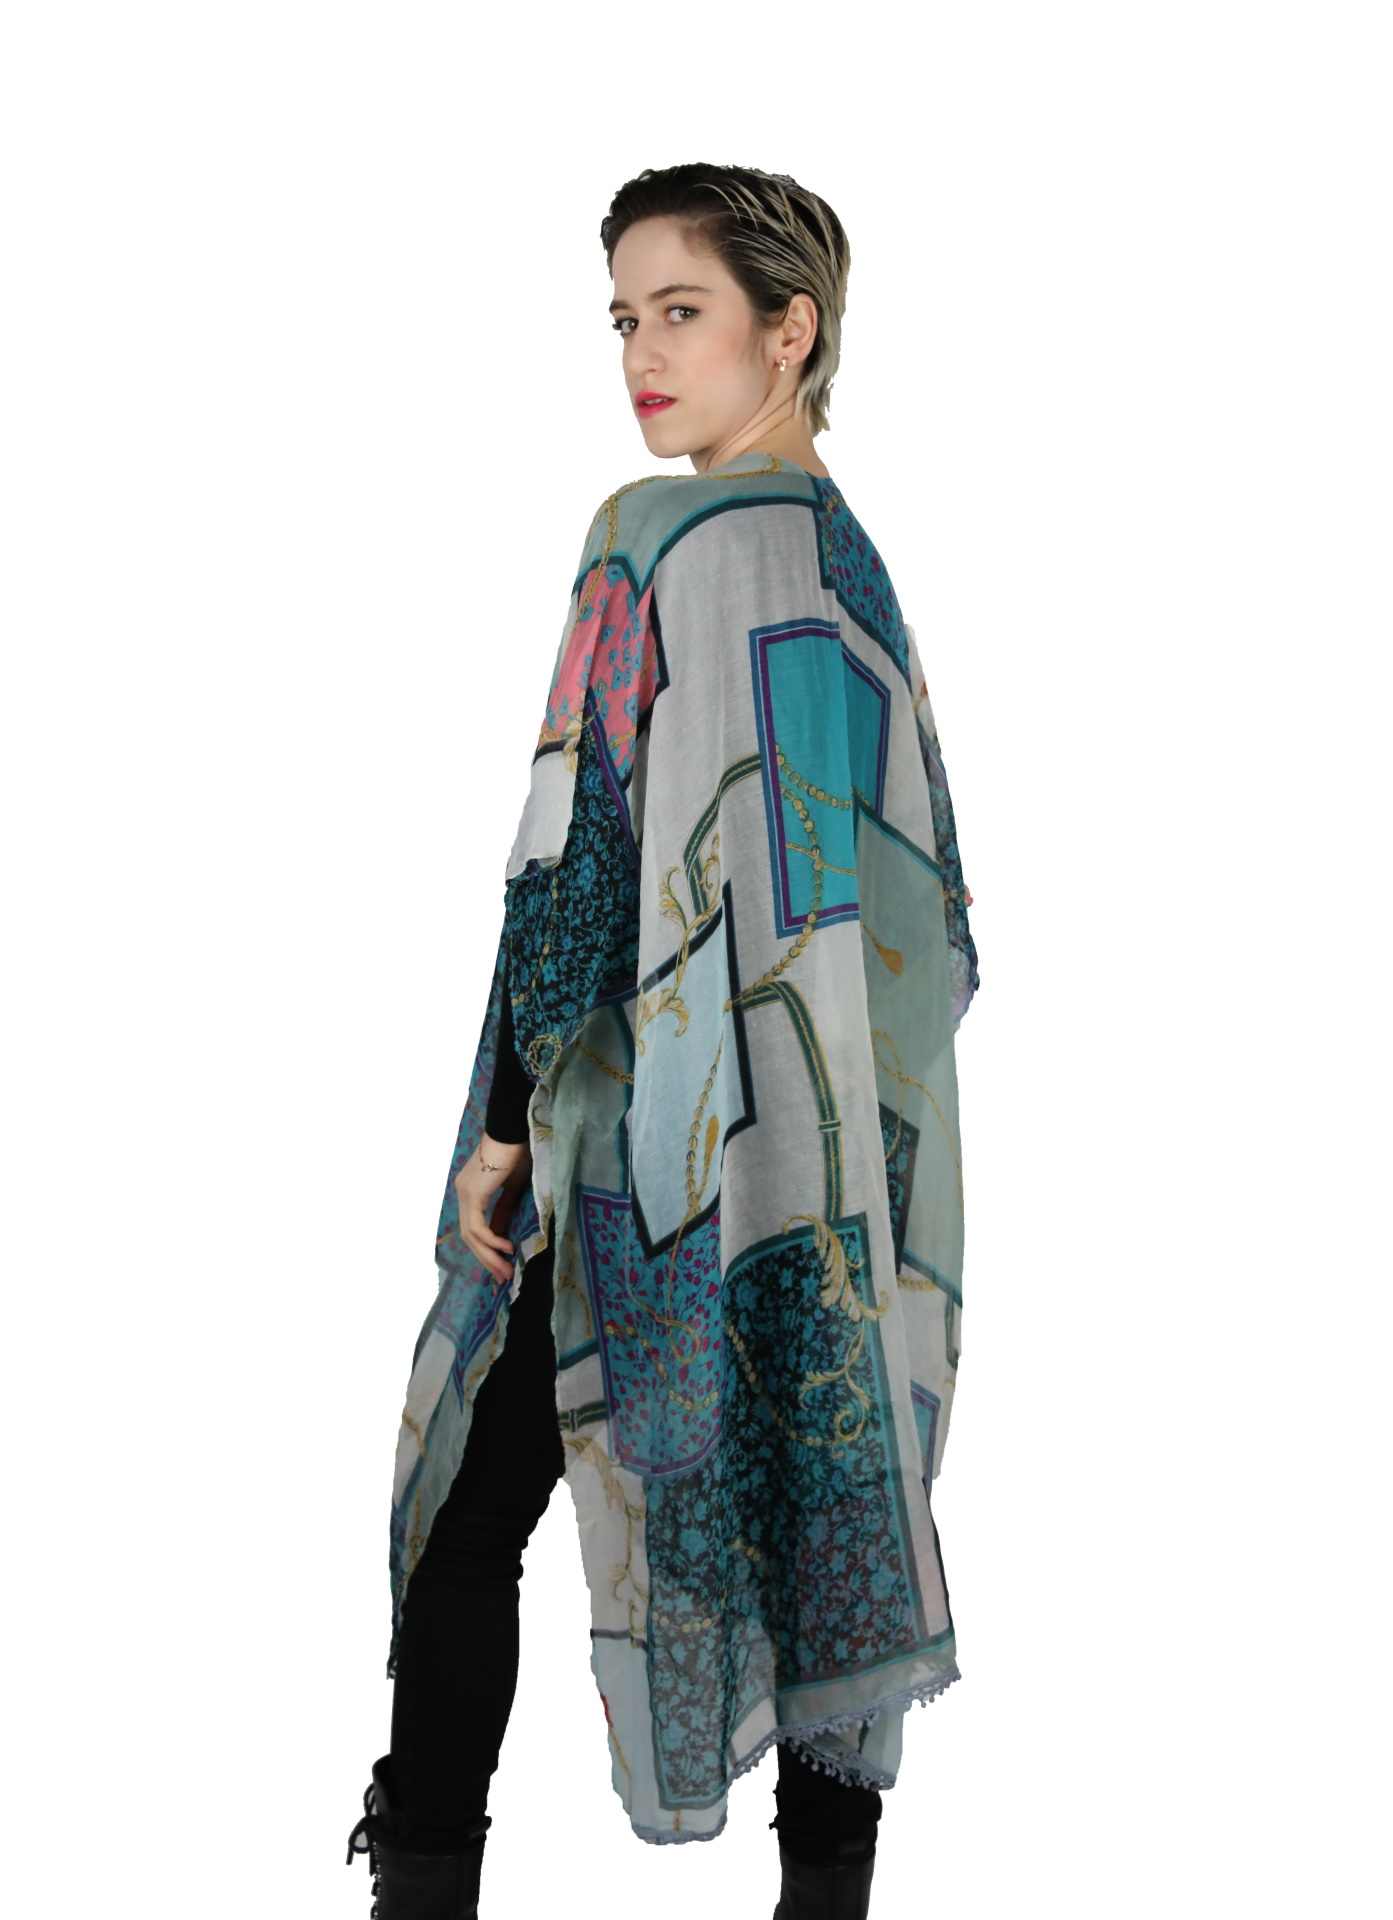 CLOTHES10 STOLA DONNA FOULARD CARDIGAN COPRISPALLE 1 1stAmerican elegante stola da donna foulard cardigan coprispalle